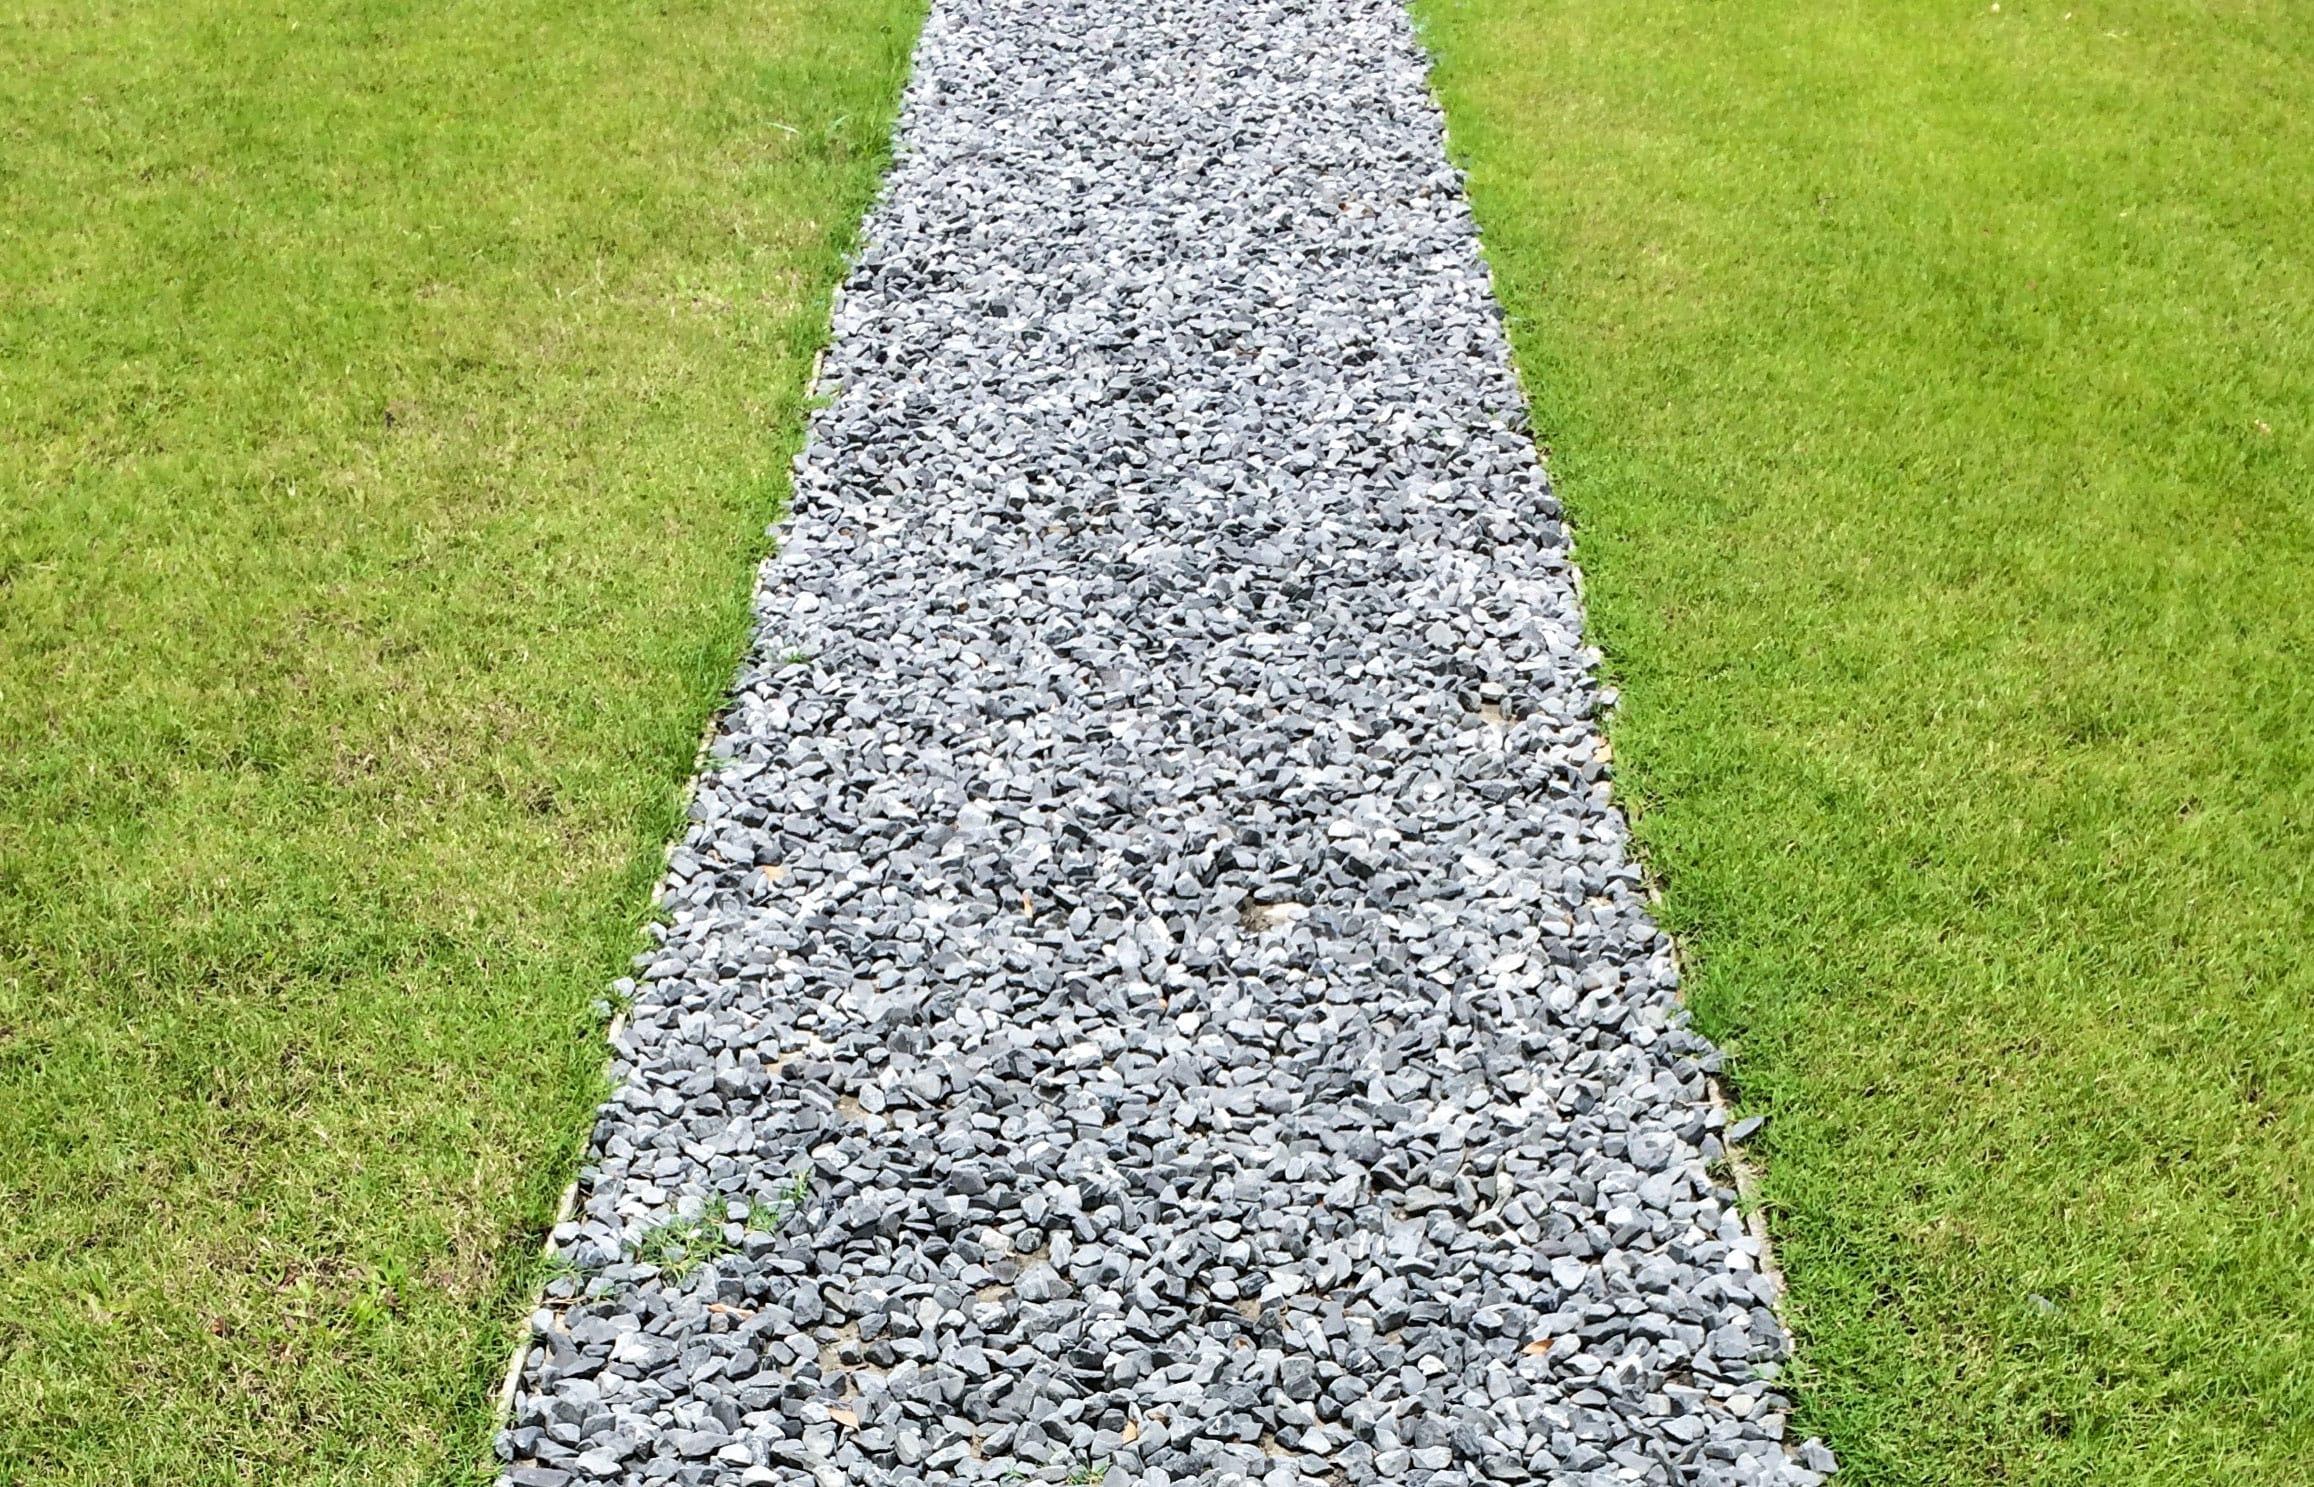 Gravel path on a lawn.